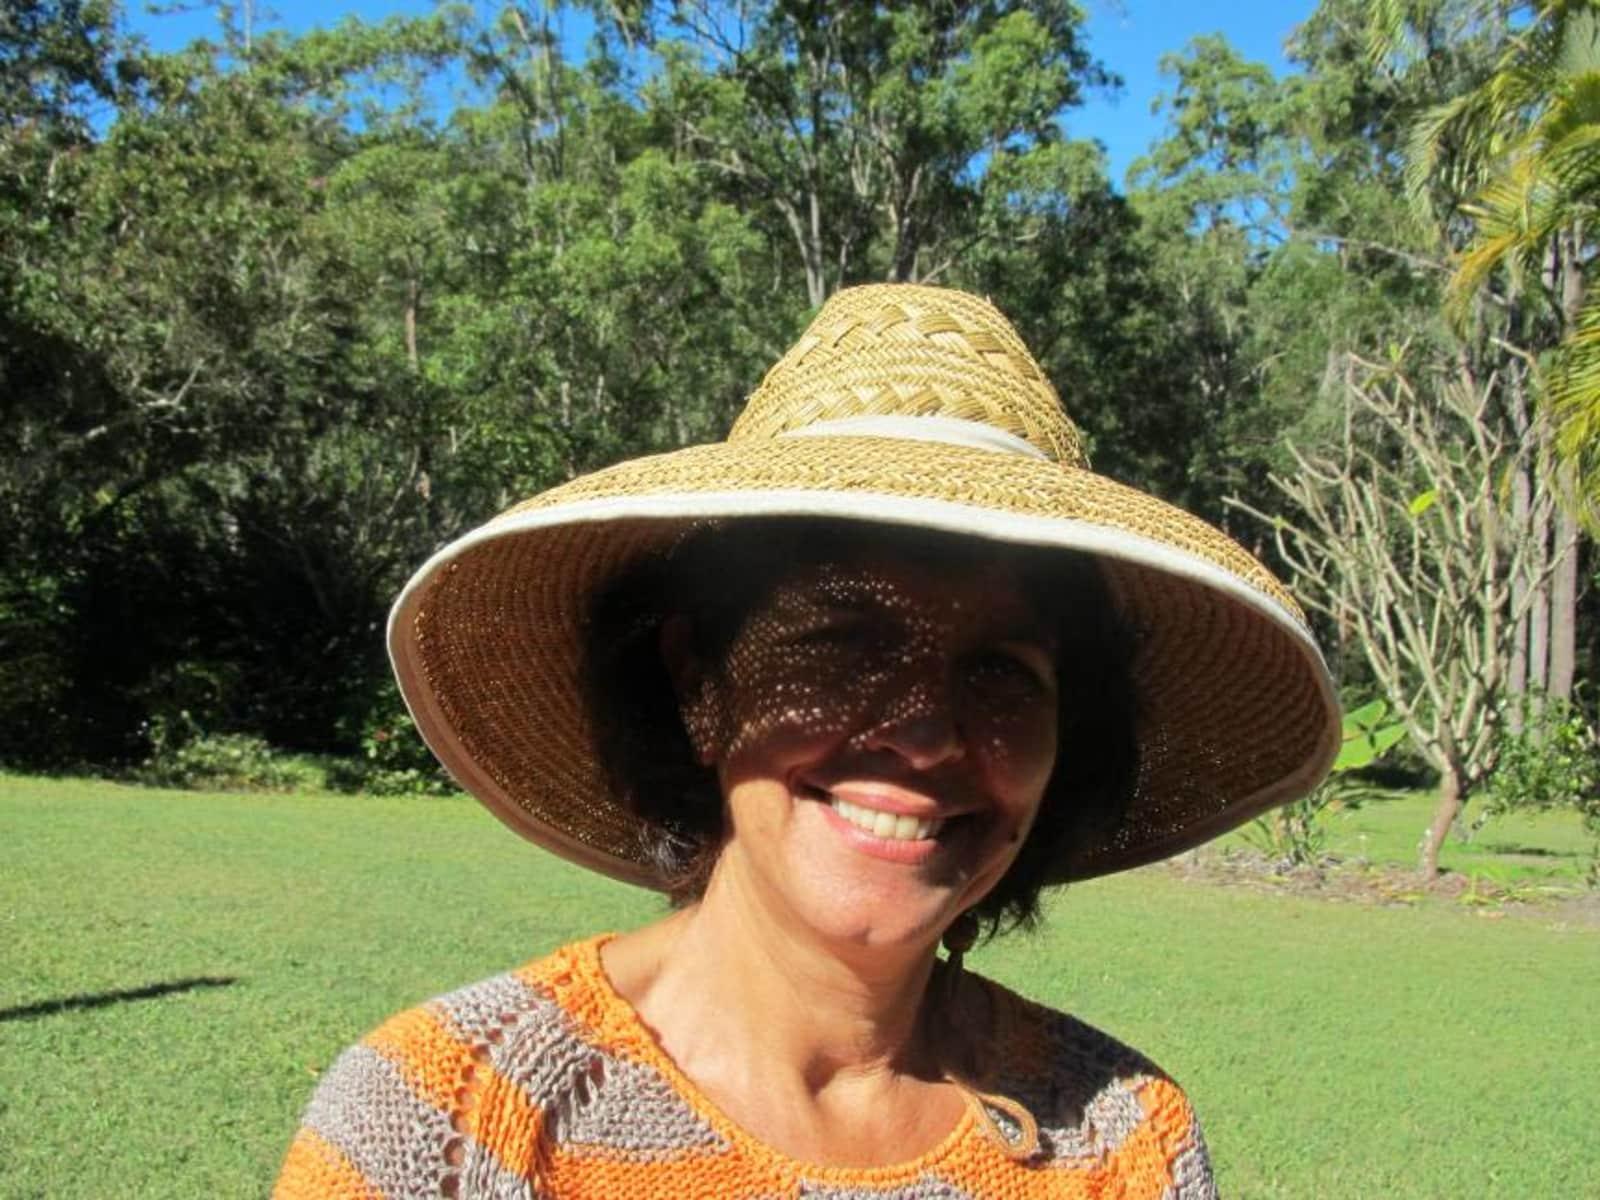 Zoe from Gold Coast, Queensland, Australia